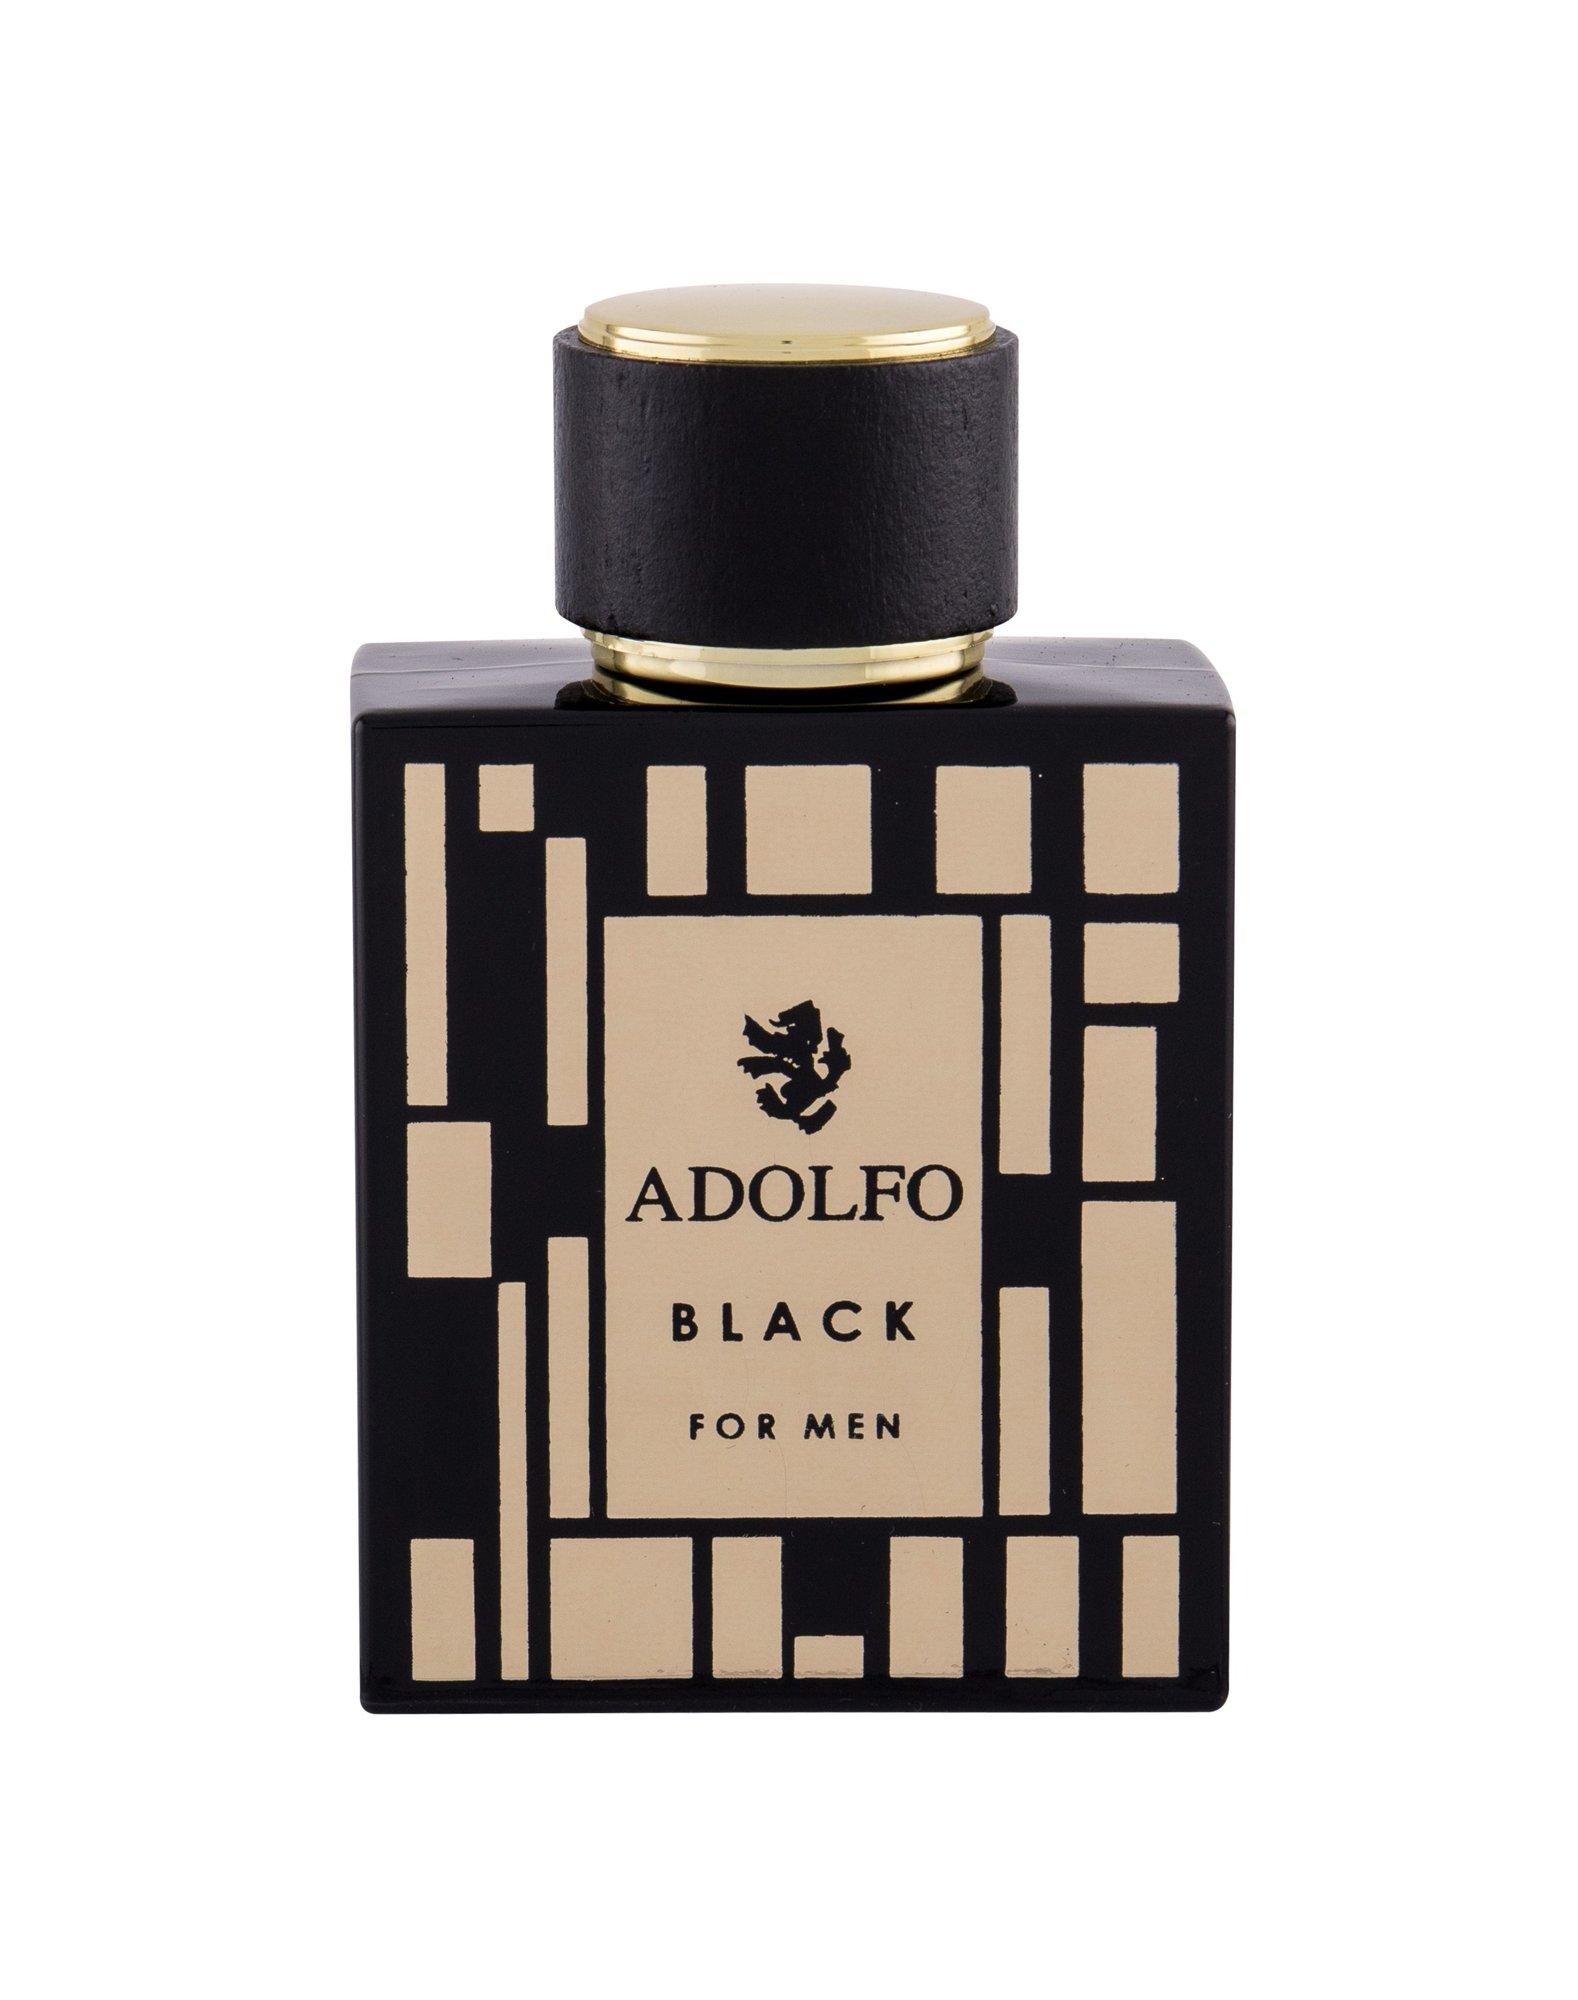 Adolfo Black Eau de Toilette 100ml